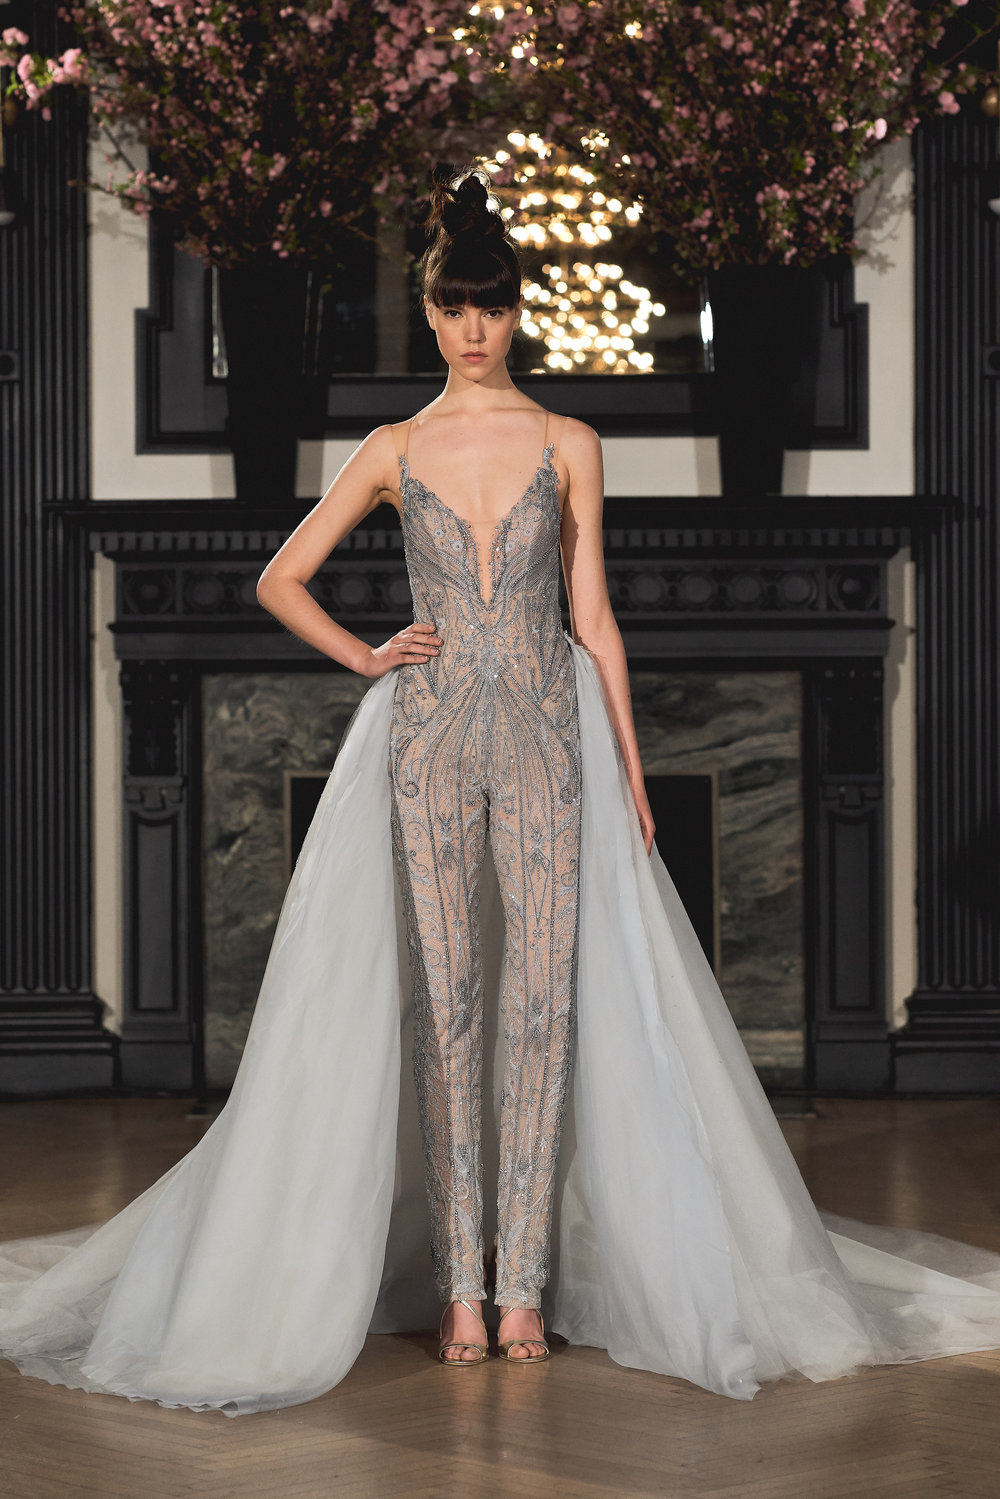 Bridal Spring 2019 Couture   LAKE    INQUIRE